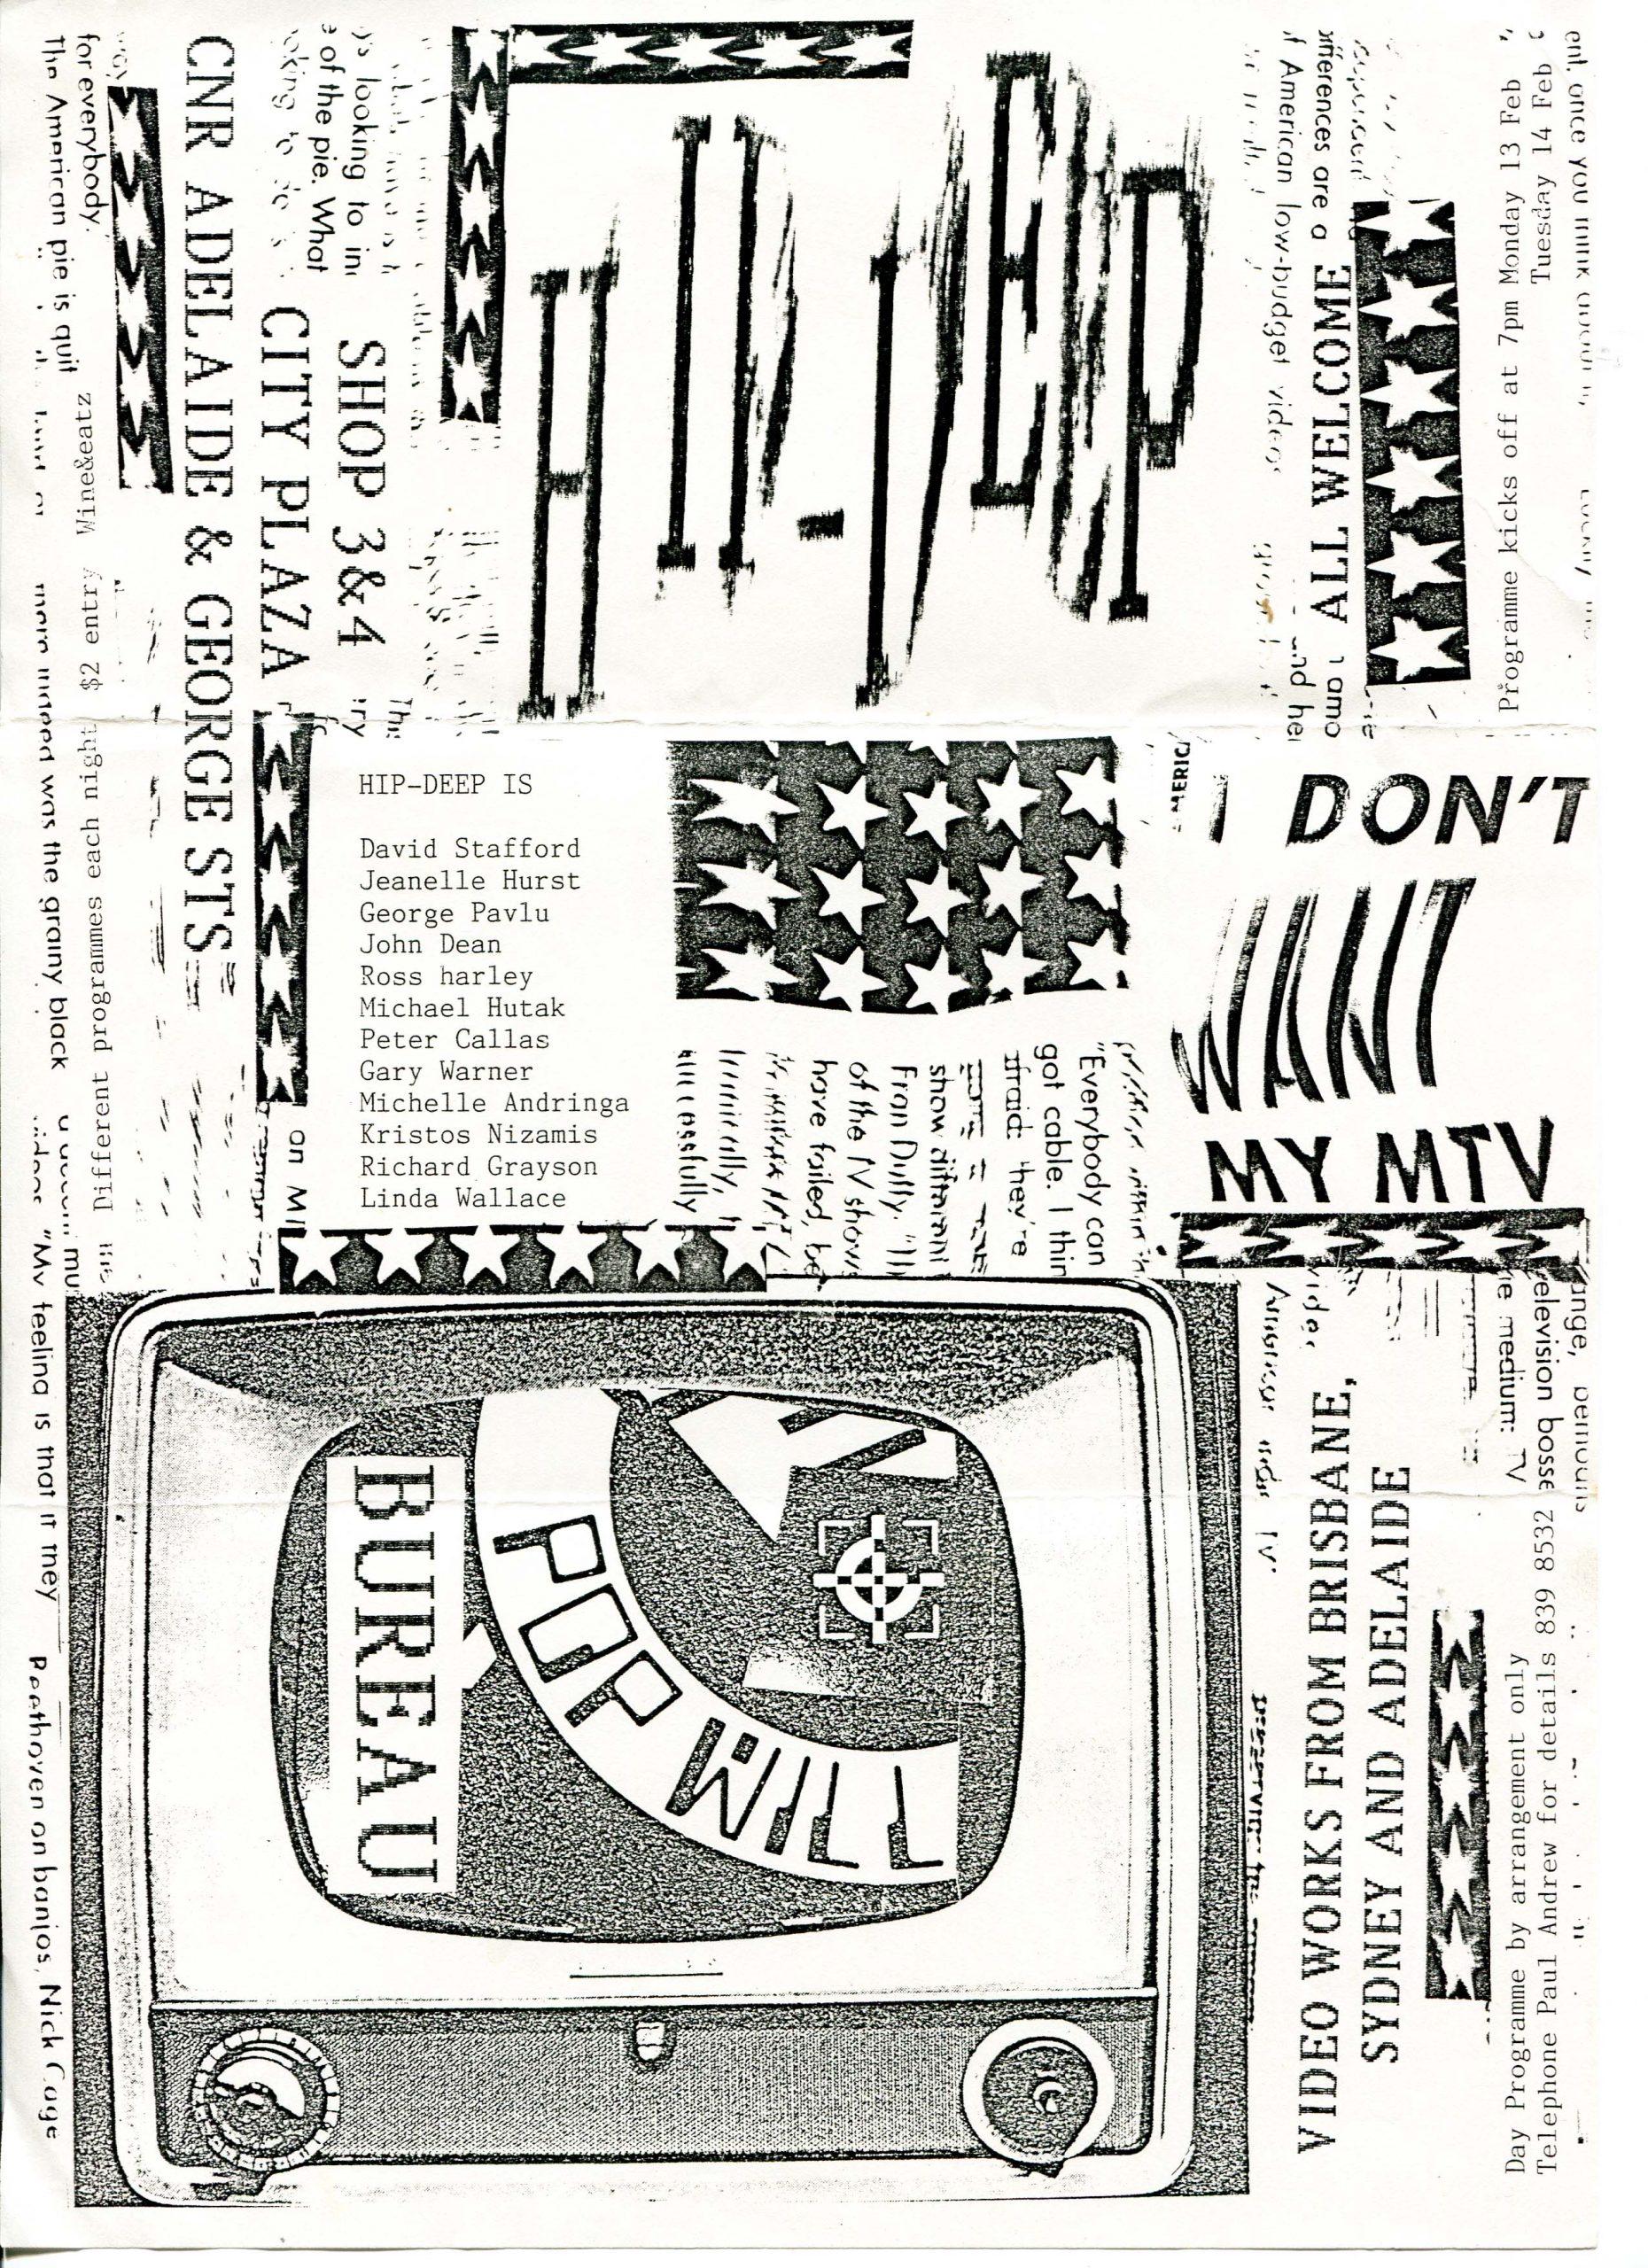 Bureau - Hip Deep curated by Gary Warner & Paul Andrew